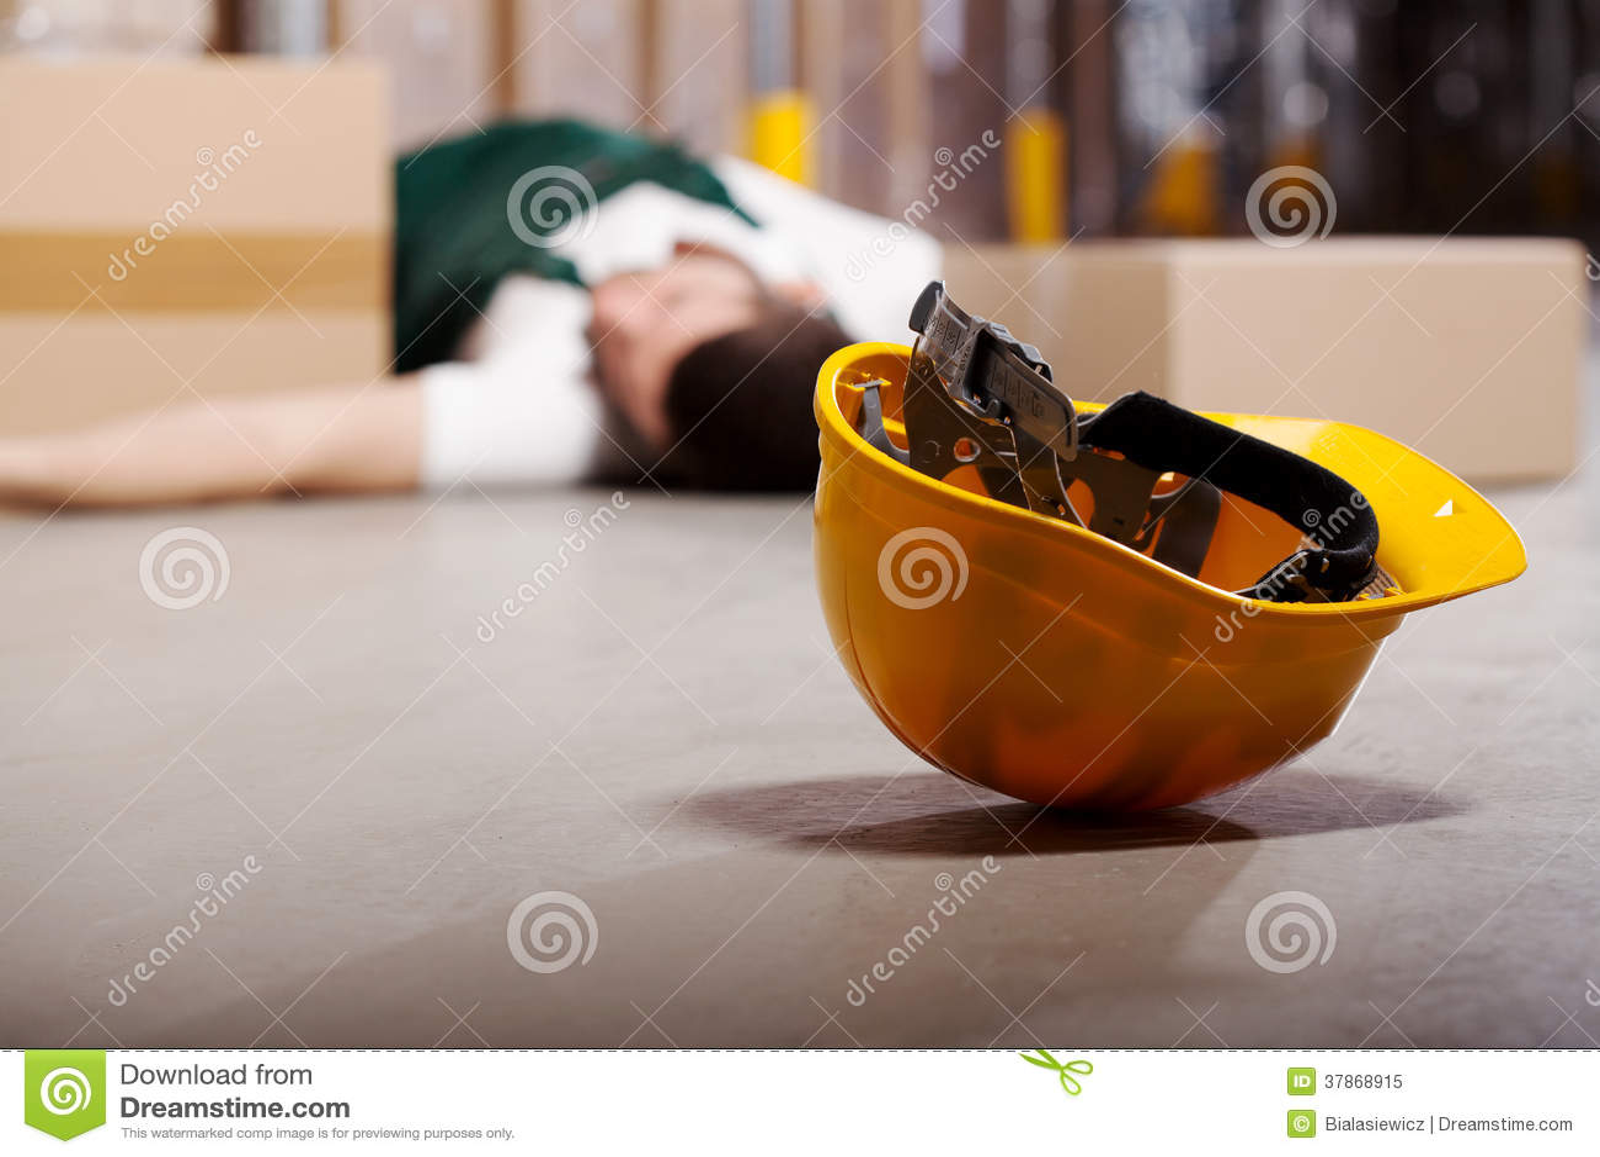 Accidente peligroso durante trabajo